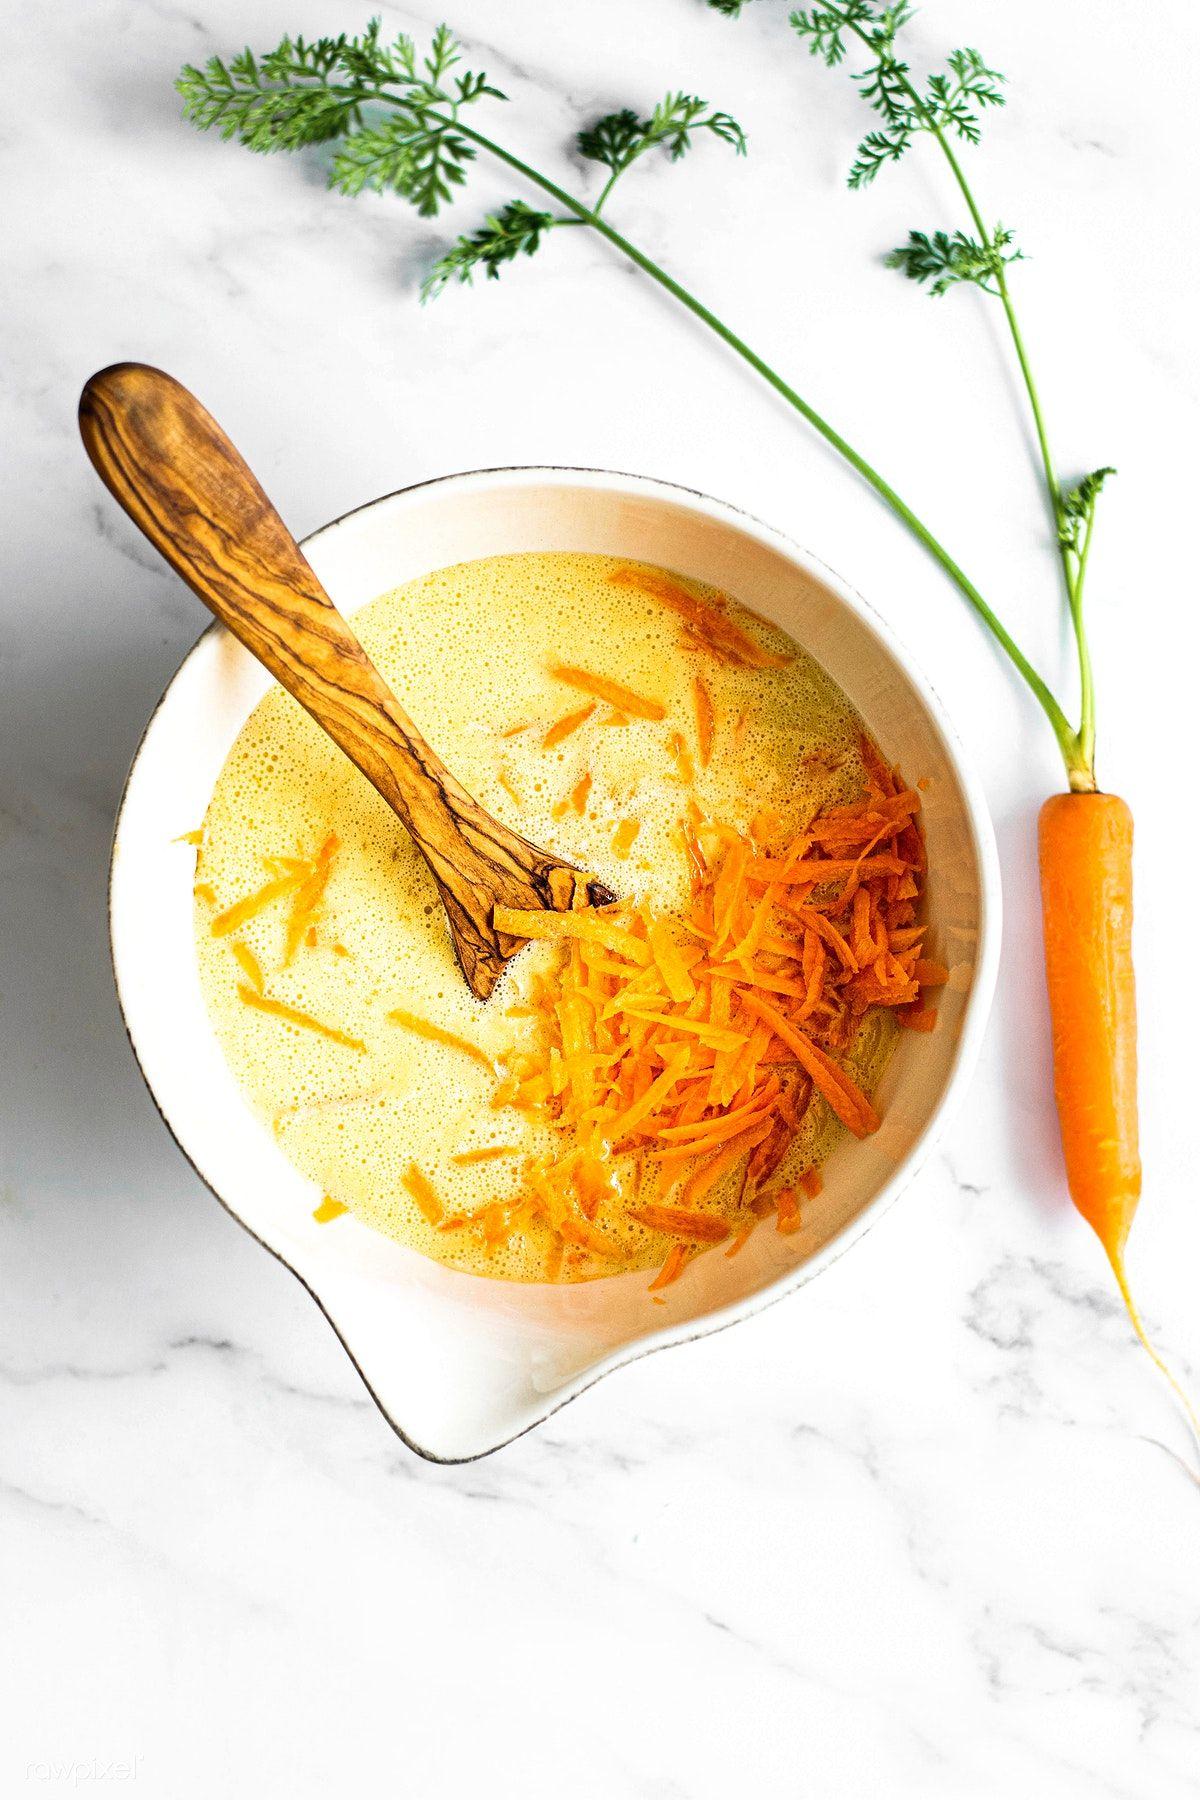 Download premium image of secret homemade carrot cake